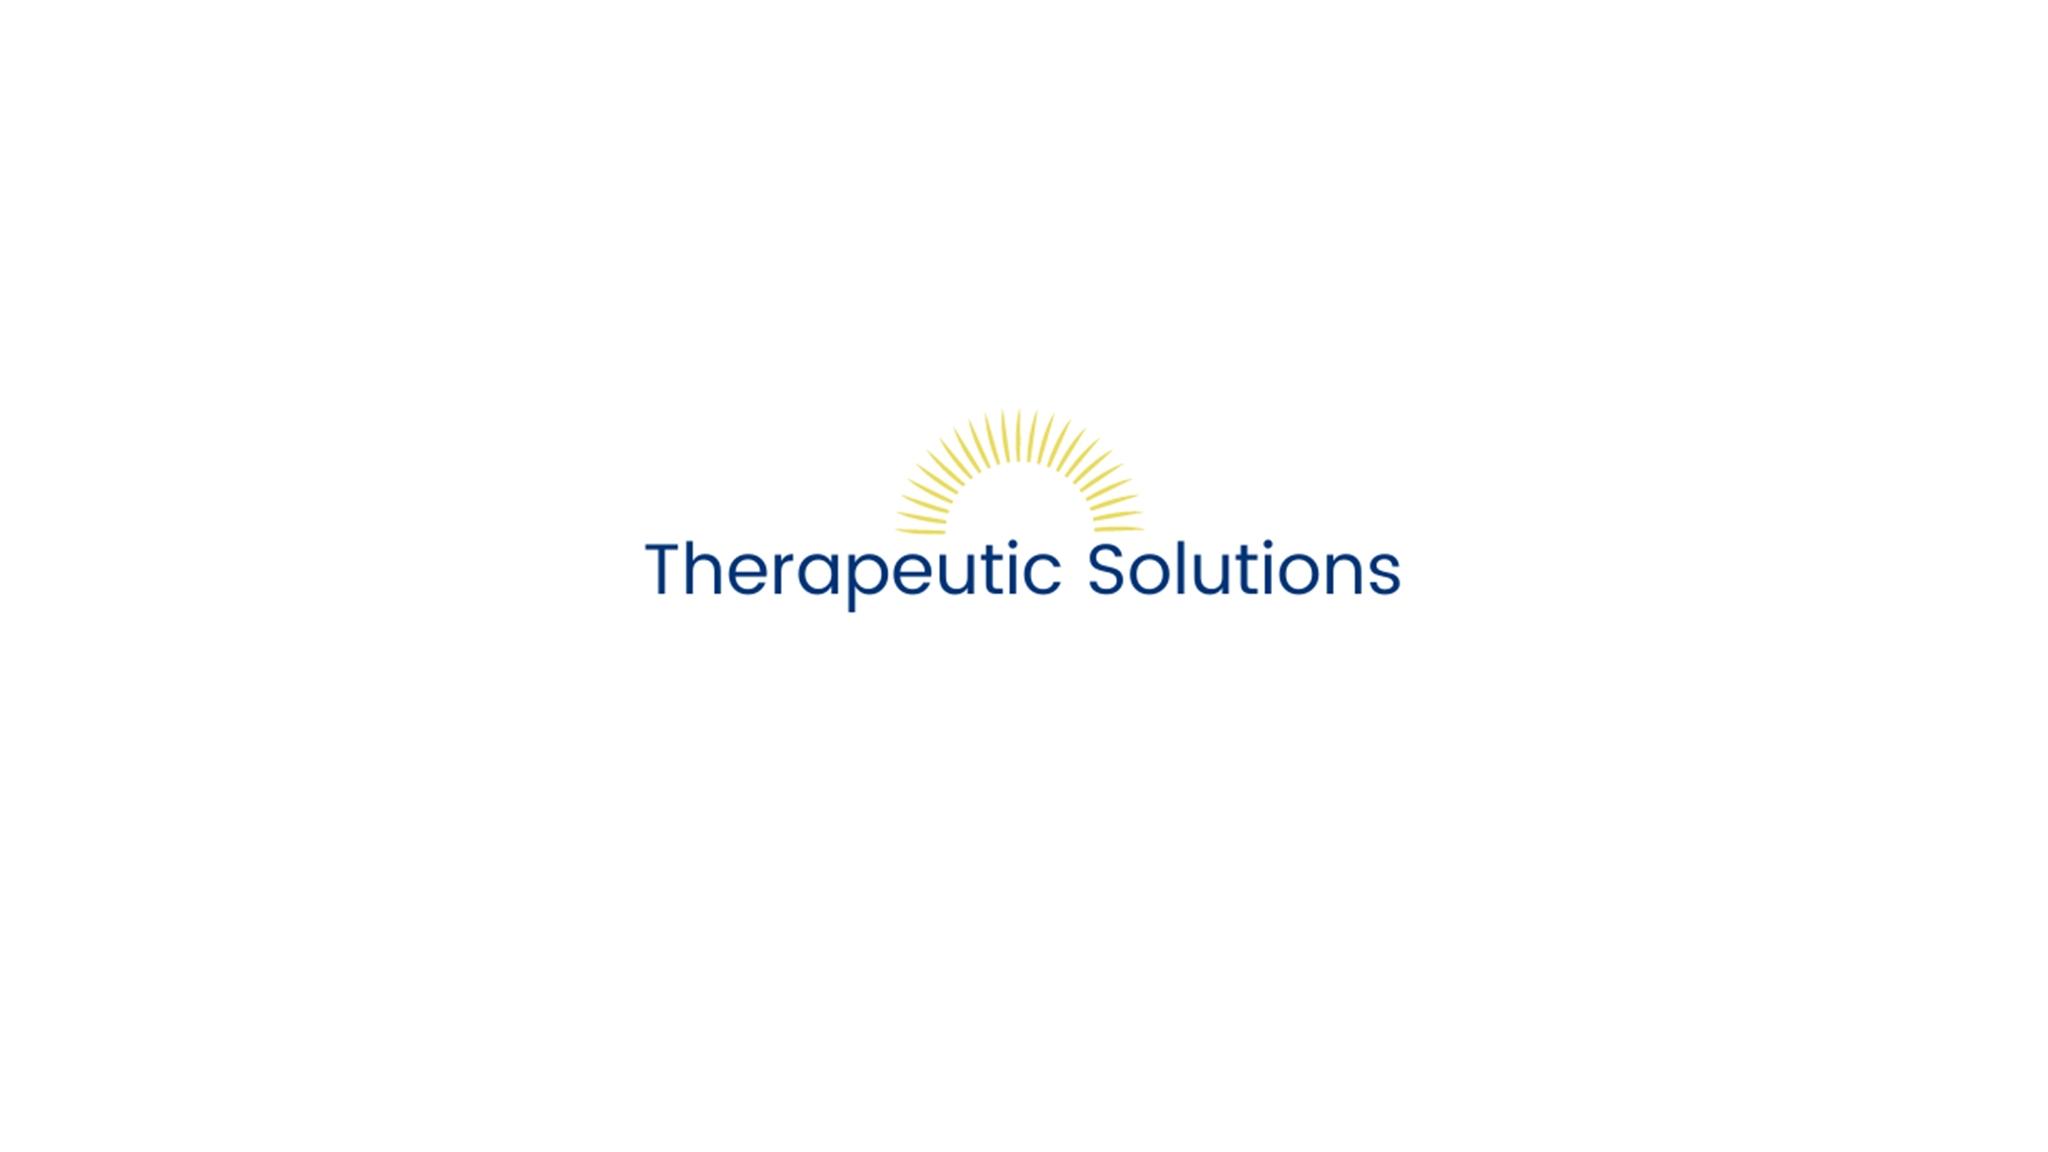 Therapeutic Solutions IOP (@therapeuticslt) Cover Image